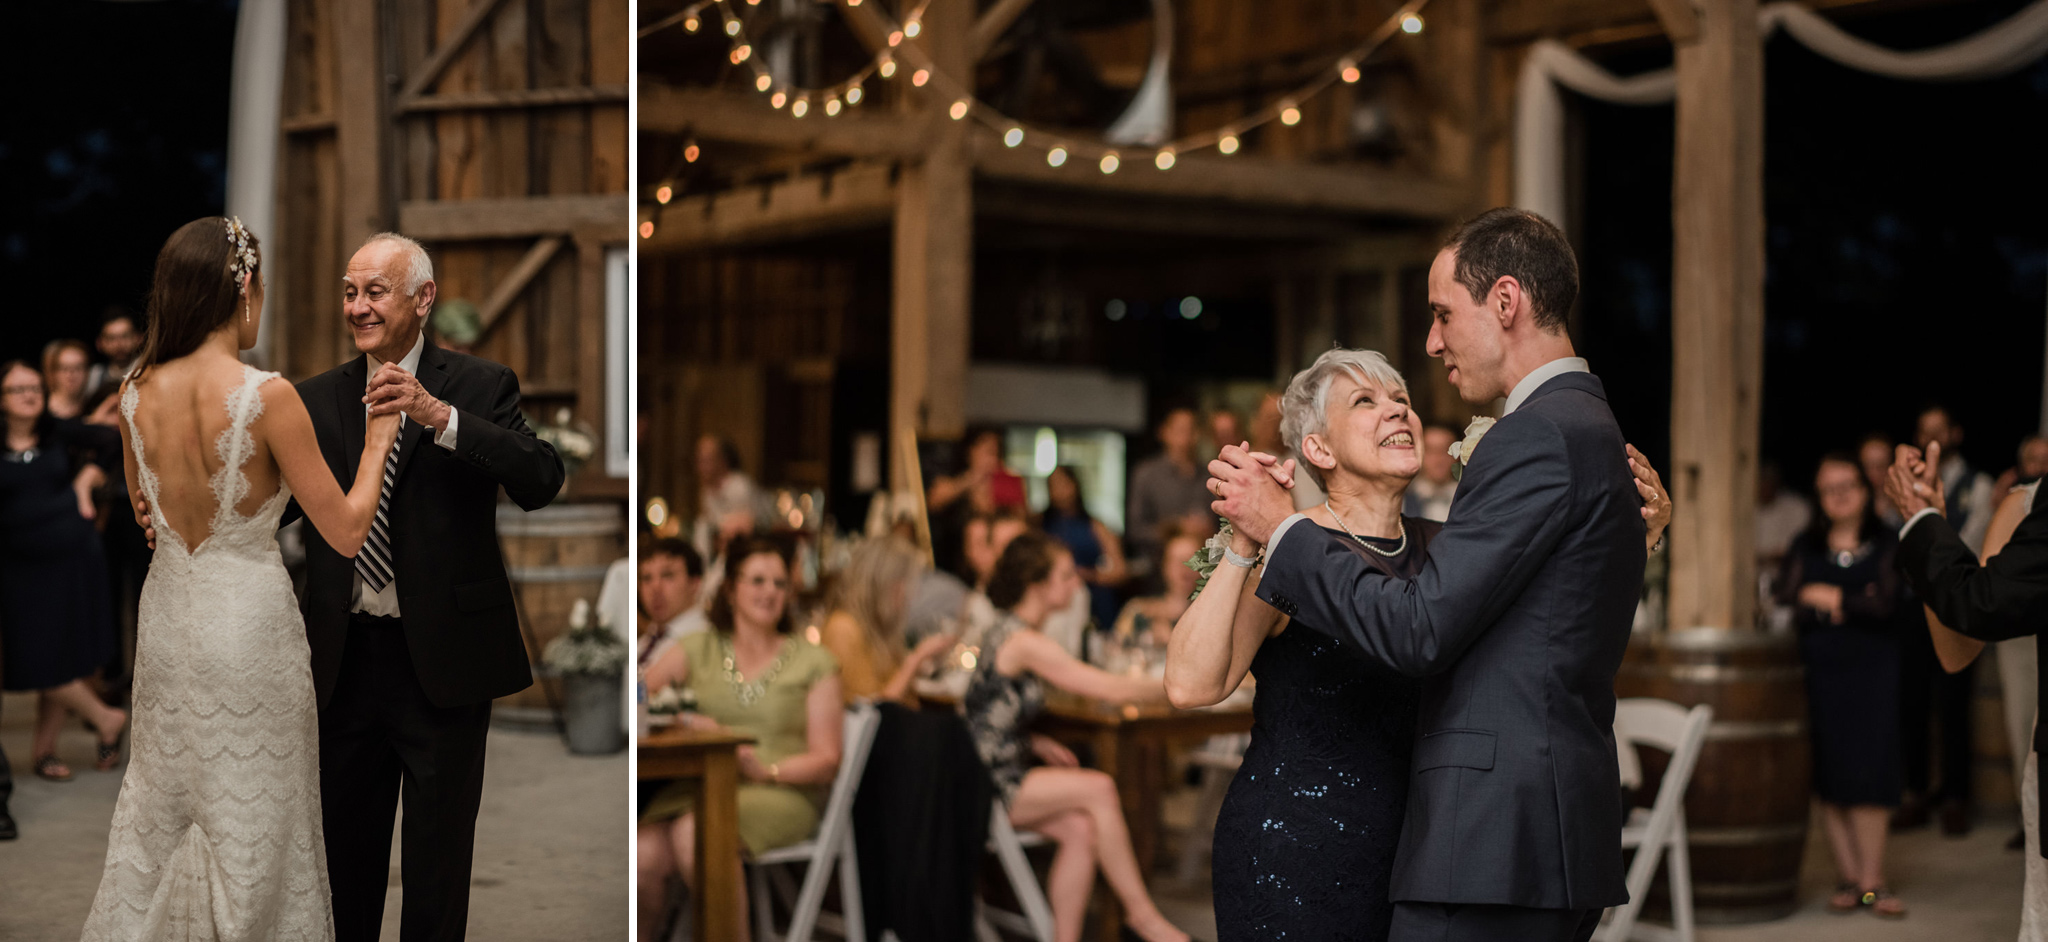 083-sydenham-ridge-wedding-first-dance-parents.jpg